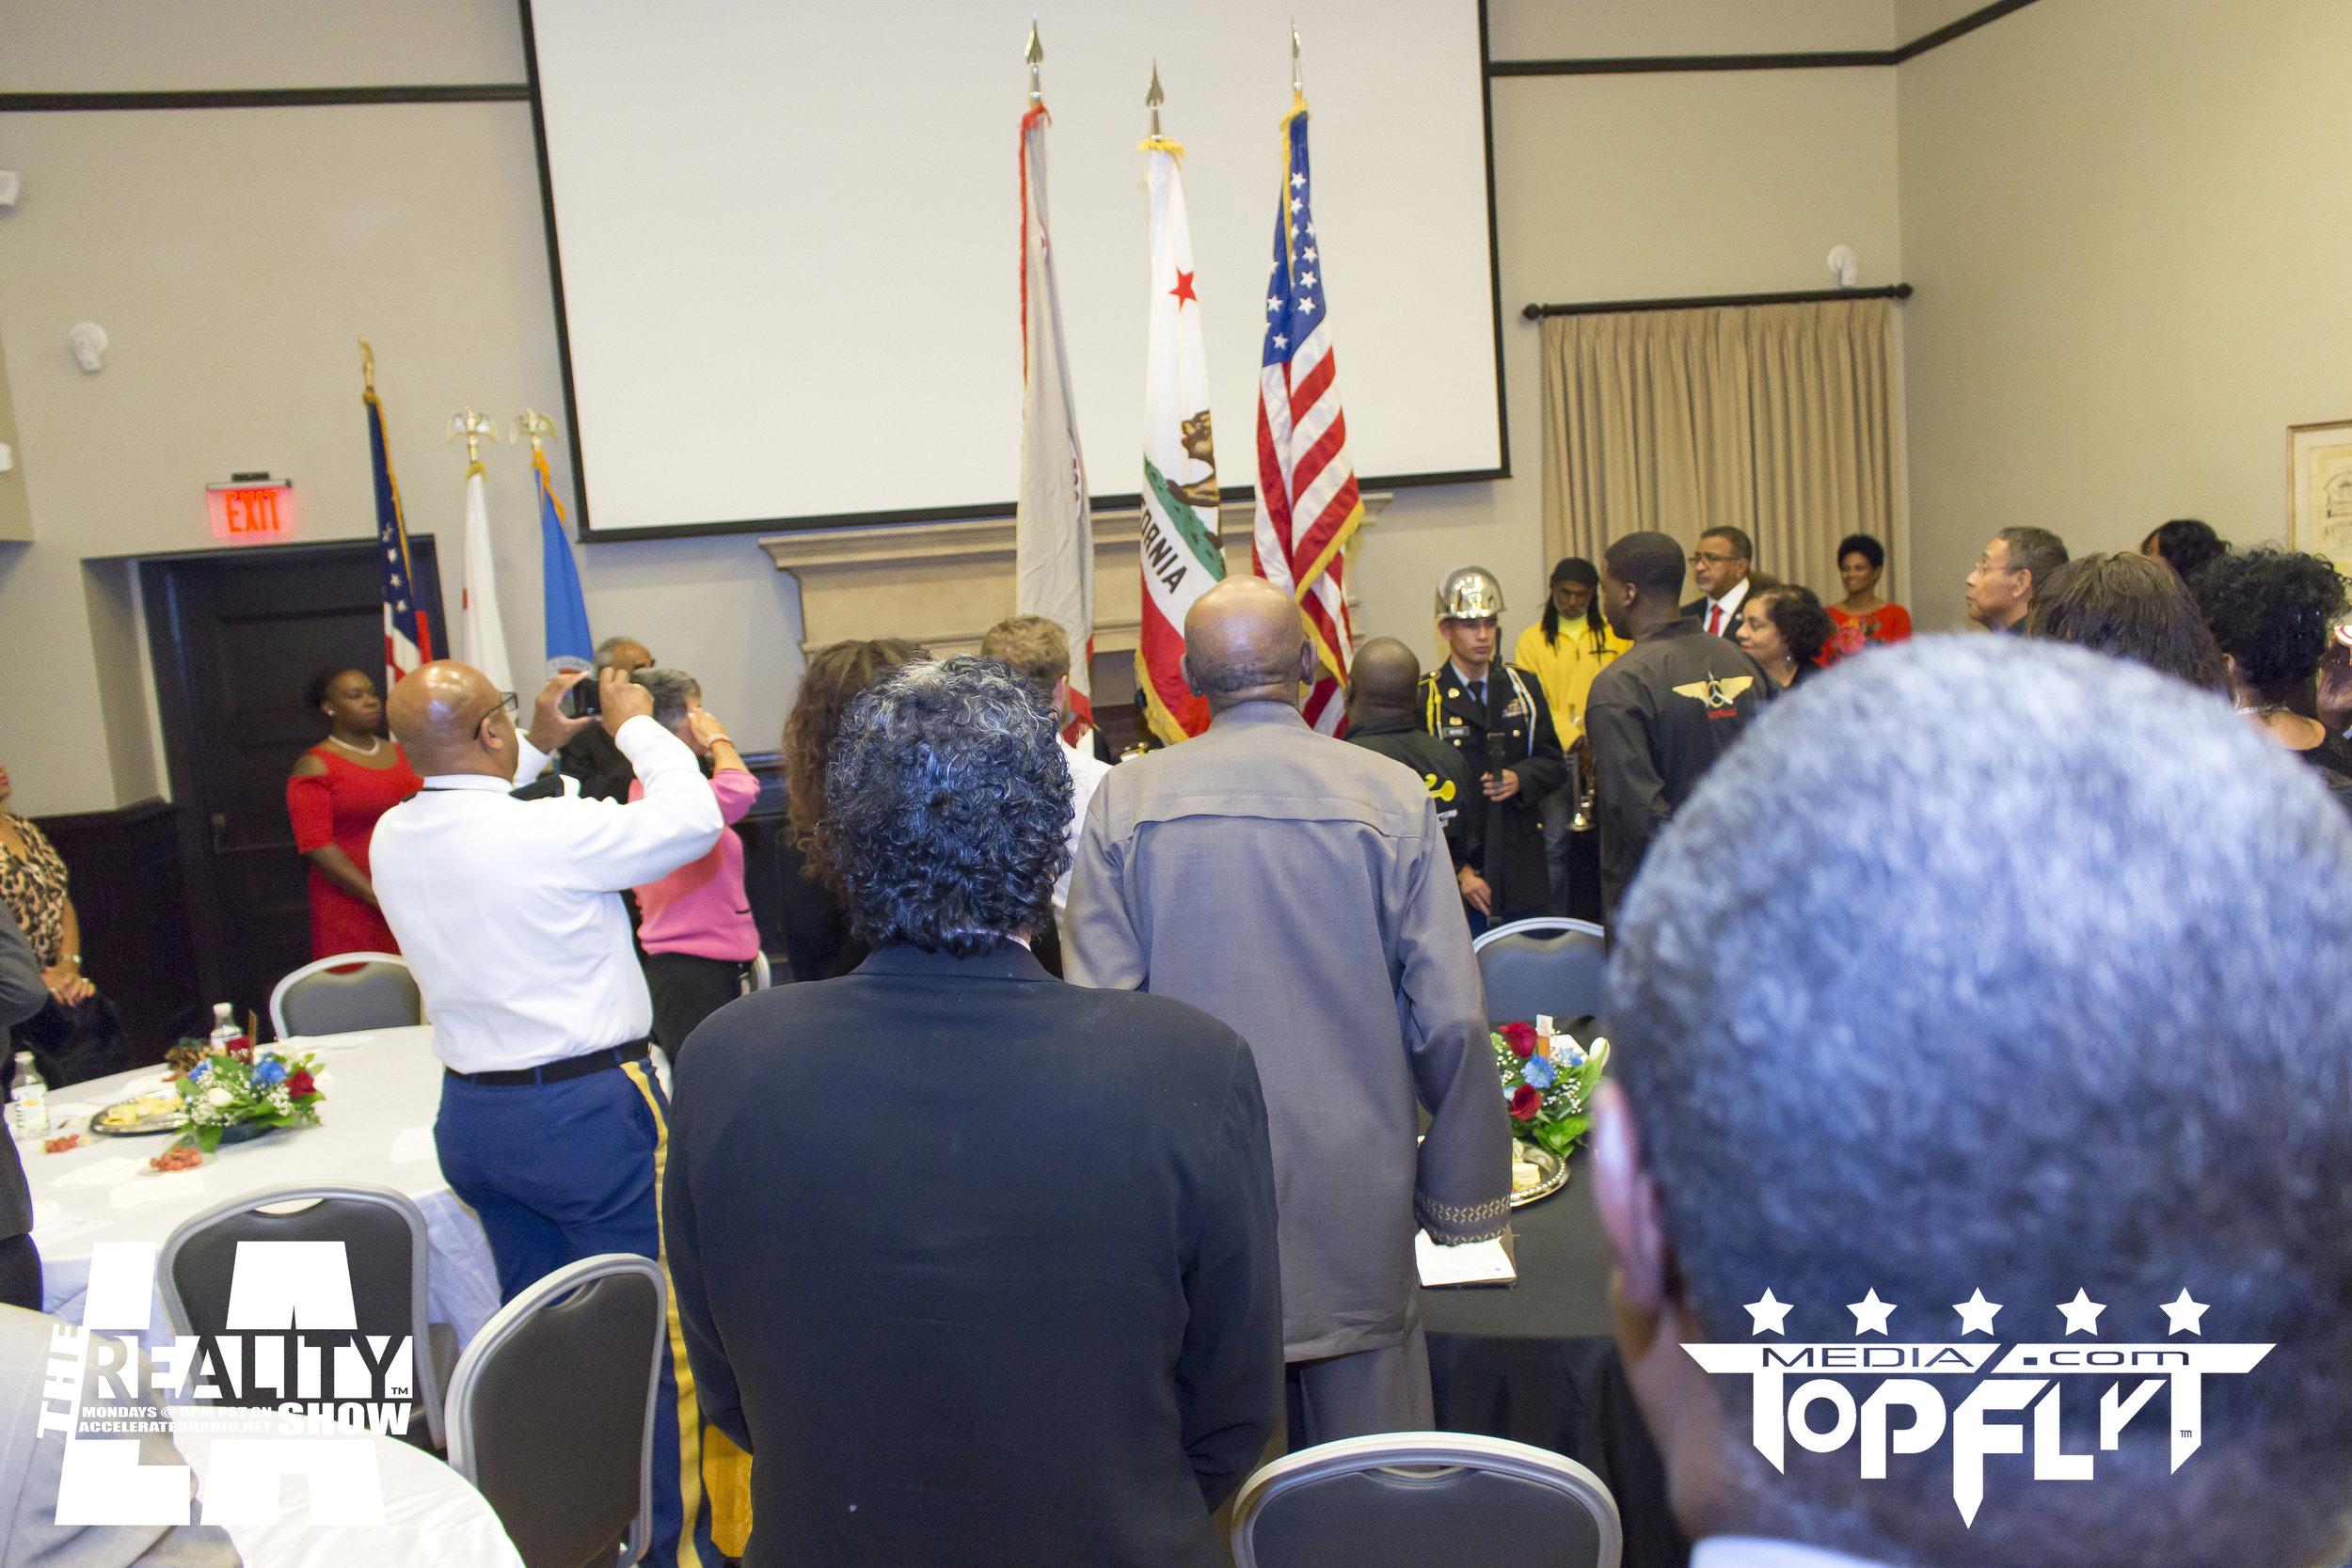 The Reality Show LA - Tuskegee Airmen 75th Anniversary VIP Reception_87.jpg